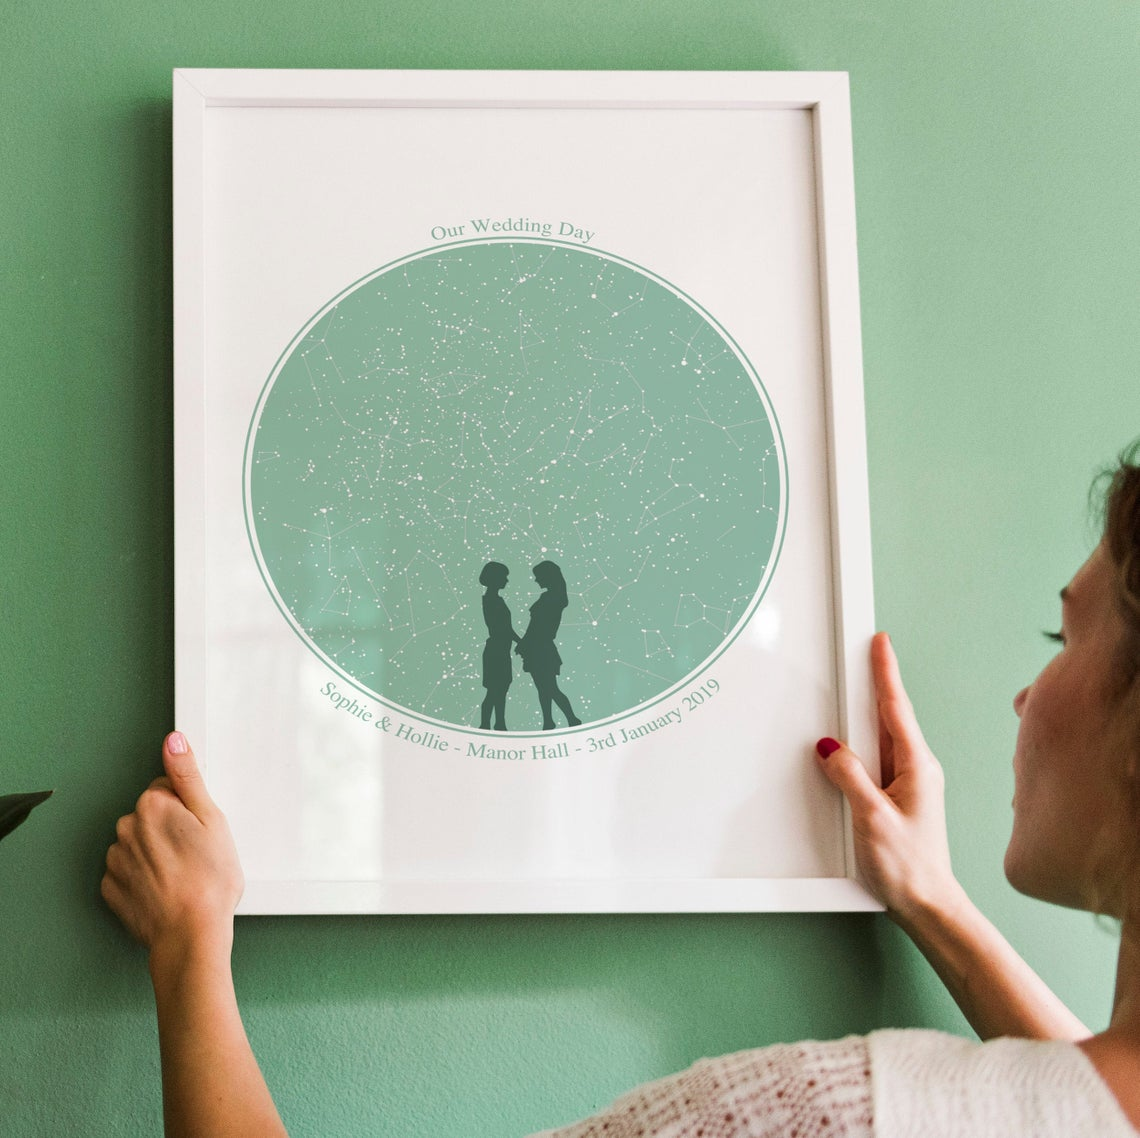 Personalised Star Map, Wedding Print, Custom Night Sky, Anniversary Gift, Constellation Map, Same Sex Wedding, Star Map Framed, Star Chart